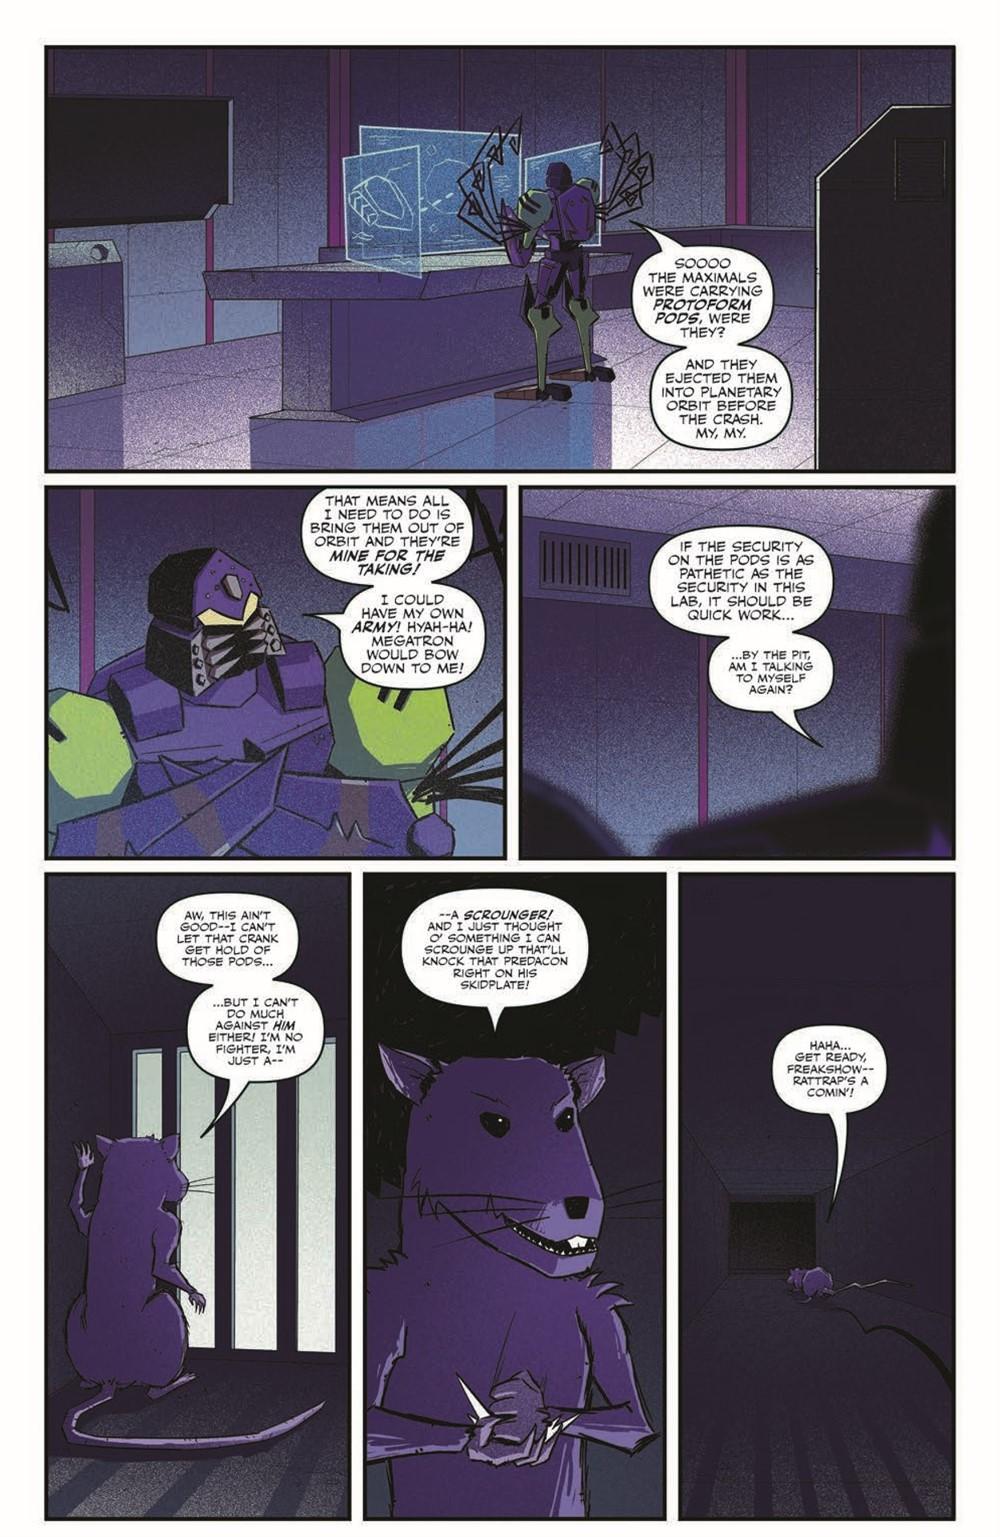 TFBW_06_pr-7 ComicList Previews: TRANSFORMERS BEAST WARS #6